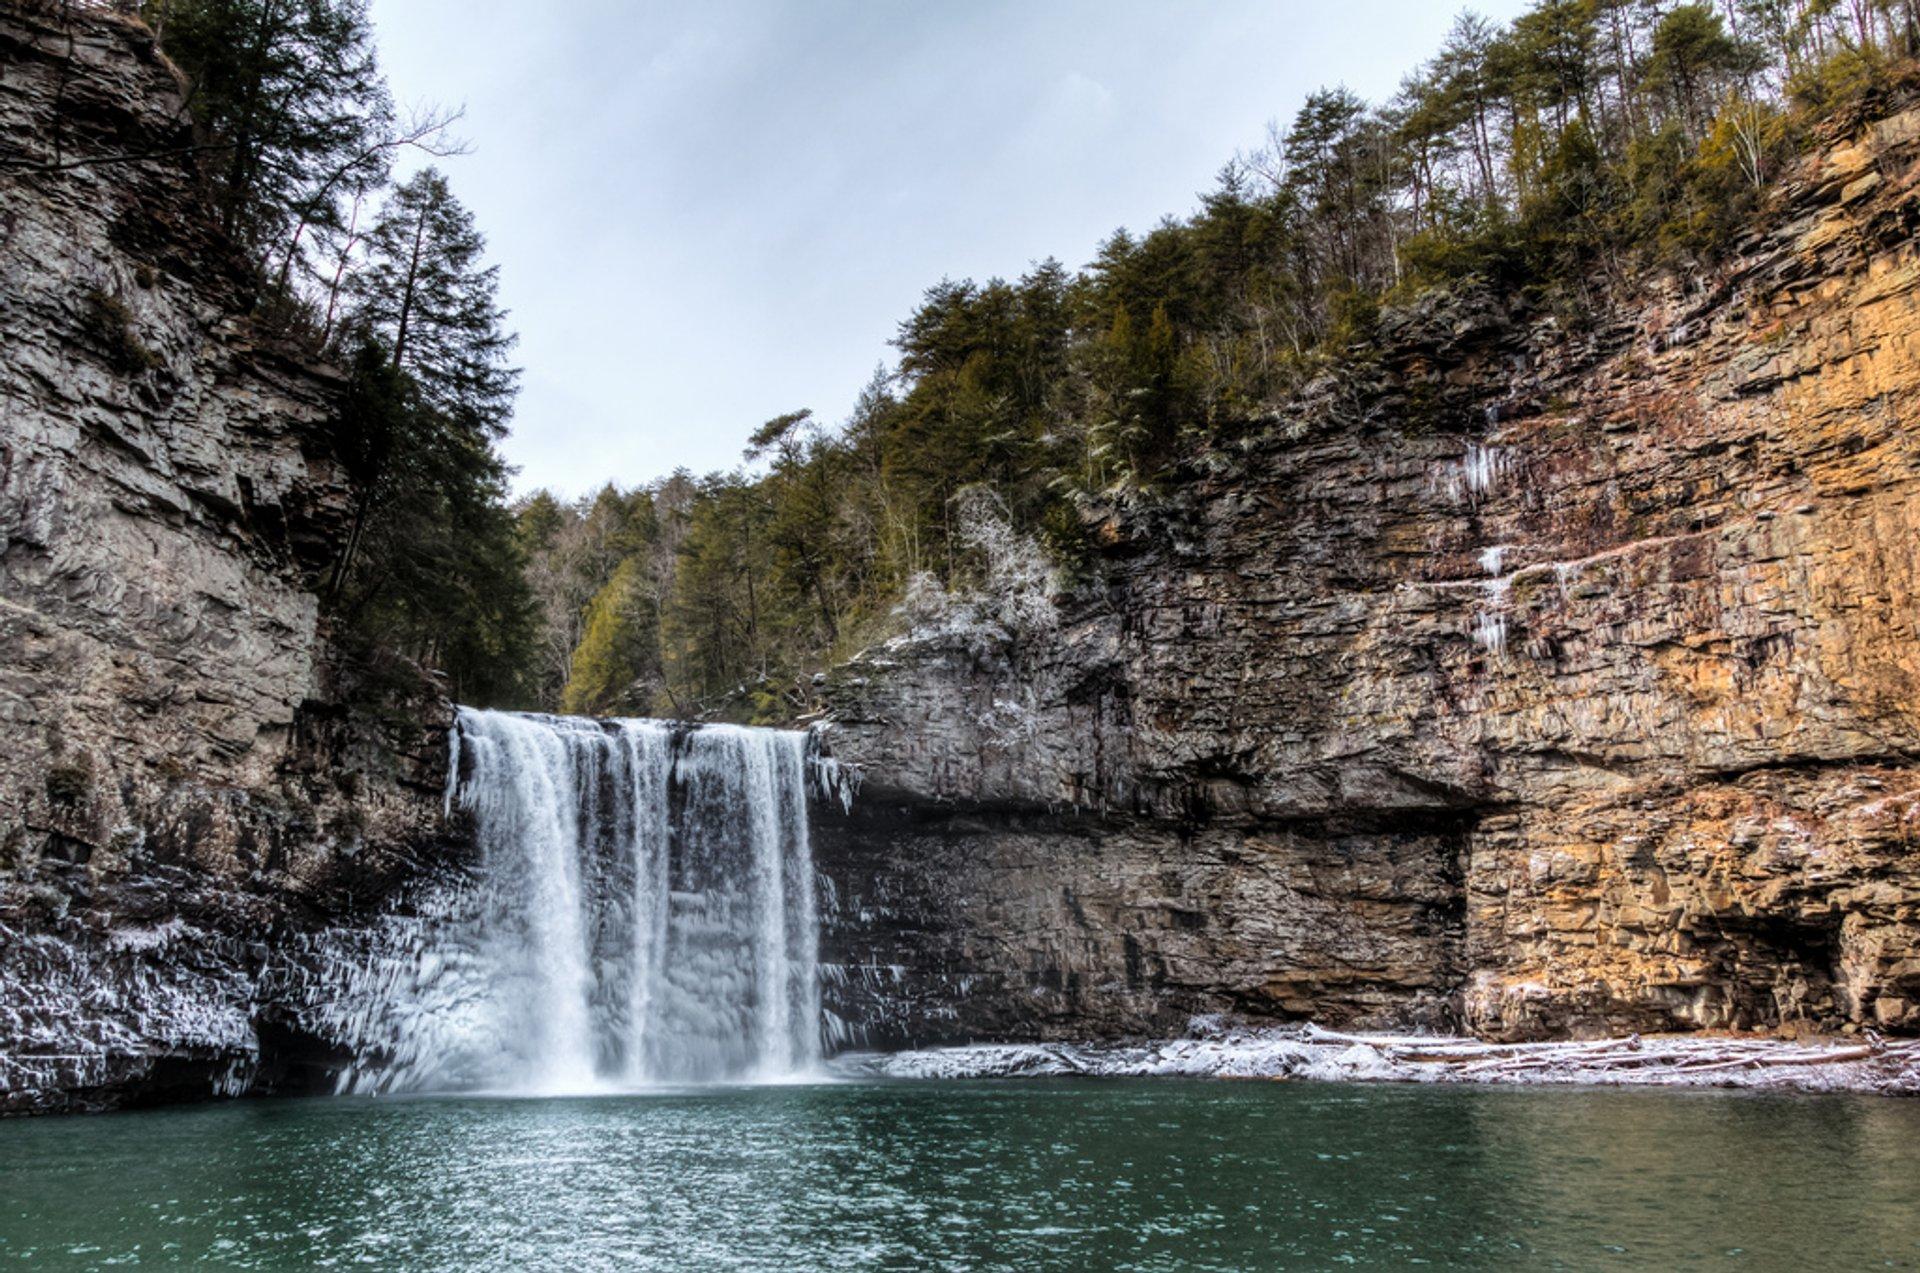 Cane Creek Falls 2019